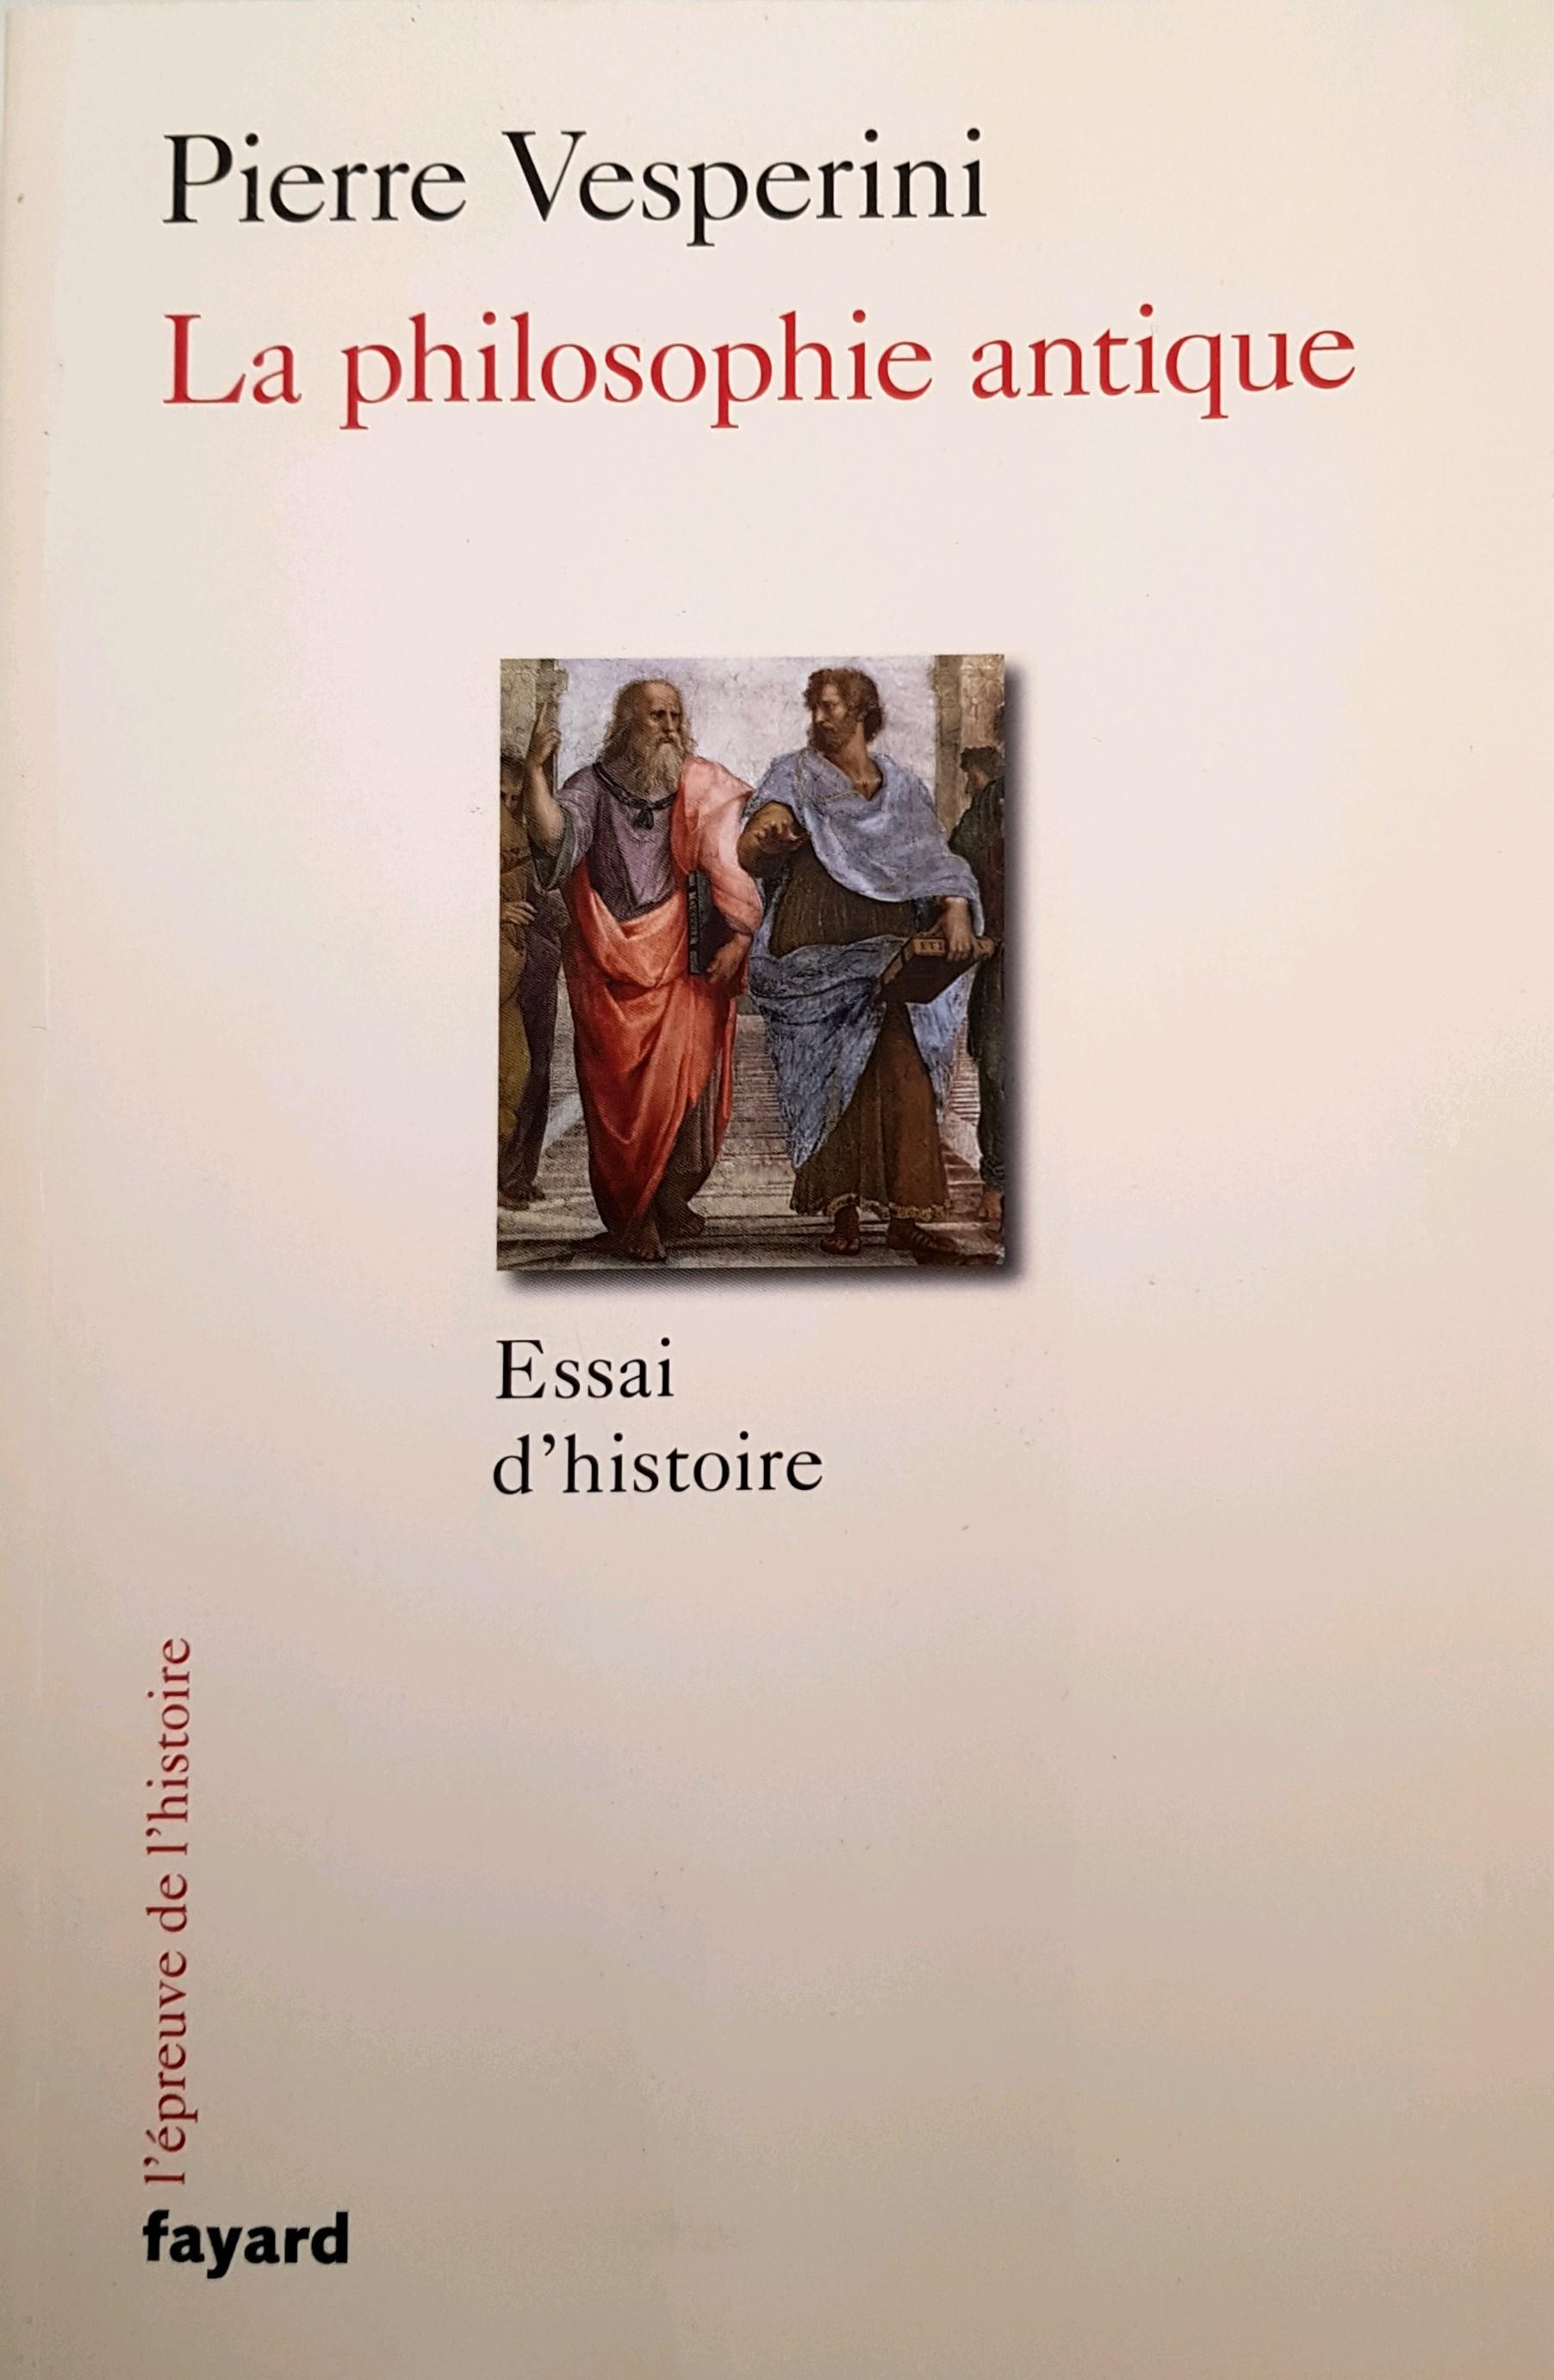 Pierre Vesperini la philosophie antique